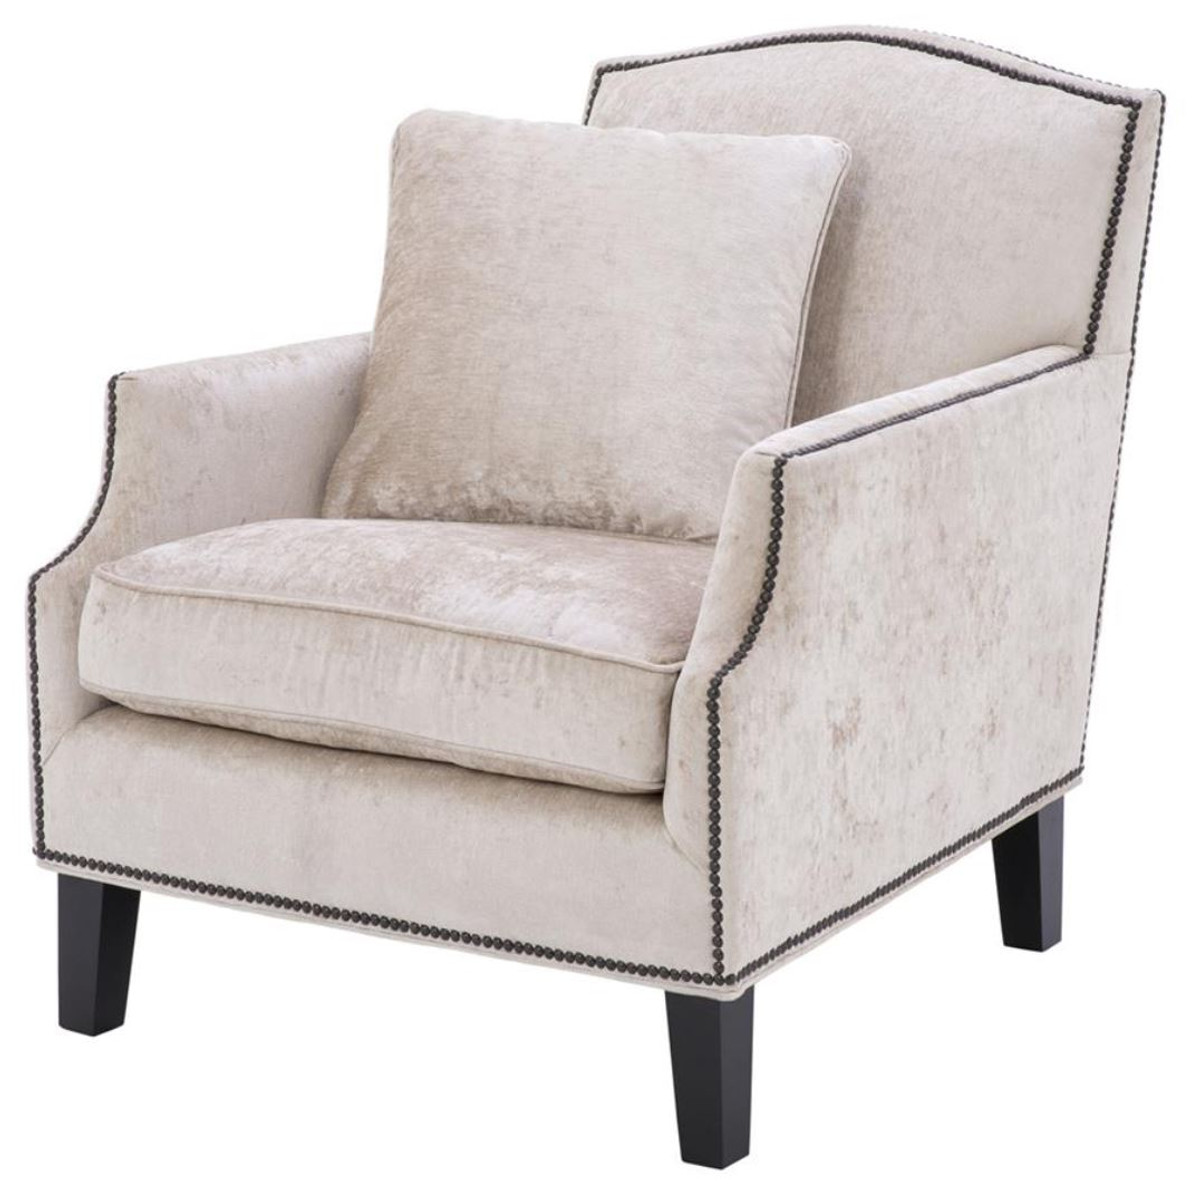 casa padrino luxus wohnzimmer sessel creme schwarz 79 x 98 x h 90 cm limited edition sessel. Black Bedroom Furniture Sets. Home Design Ideas